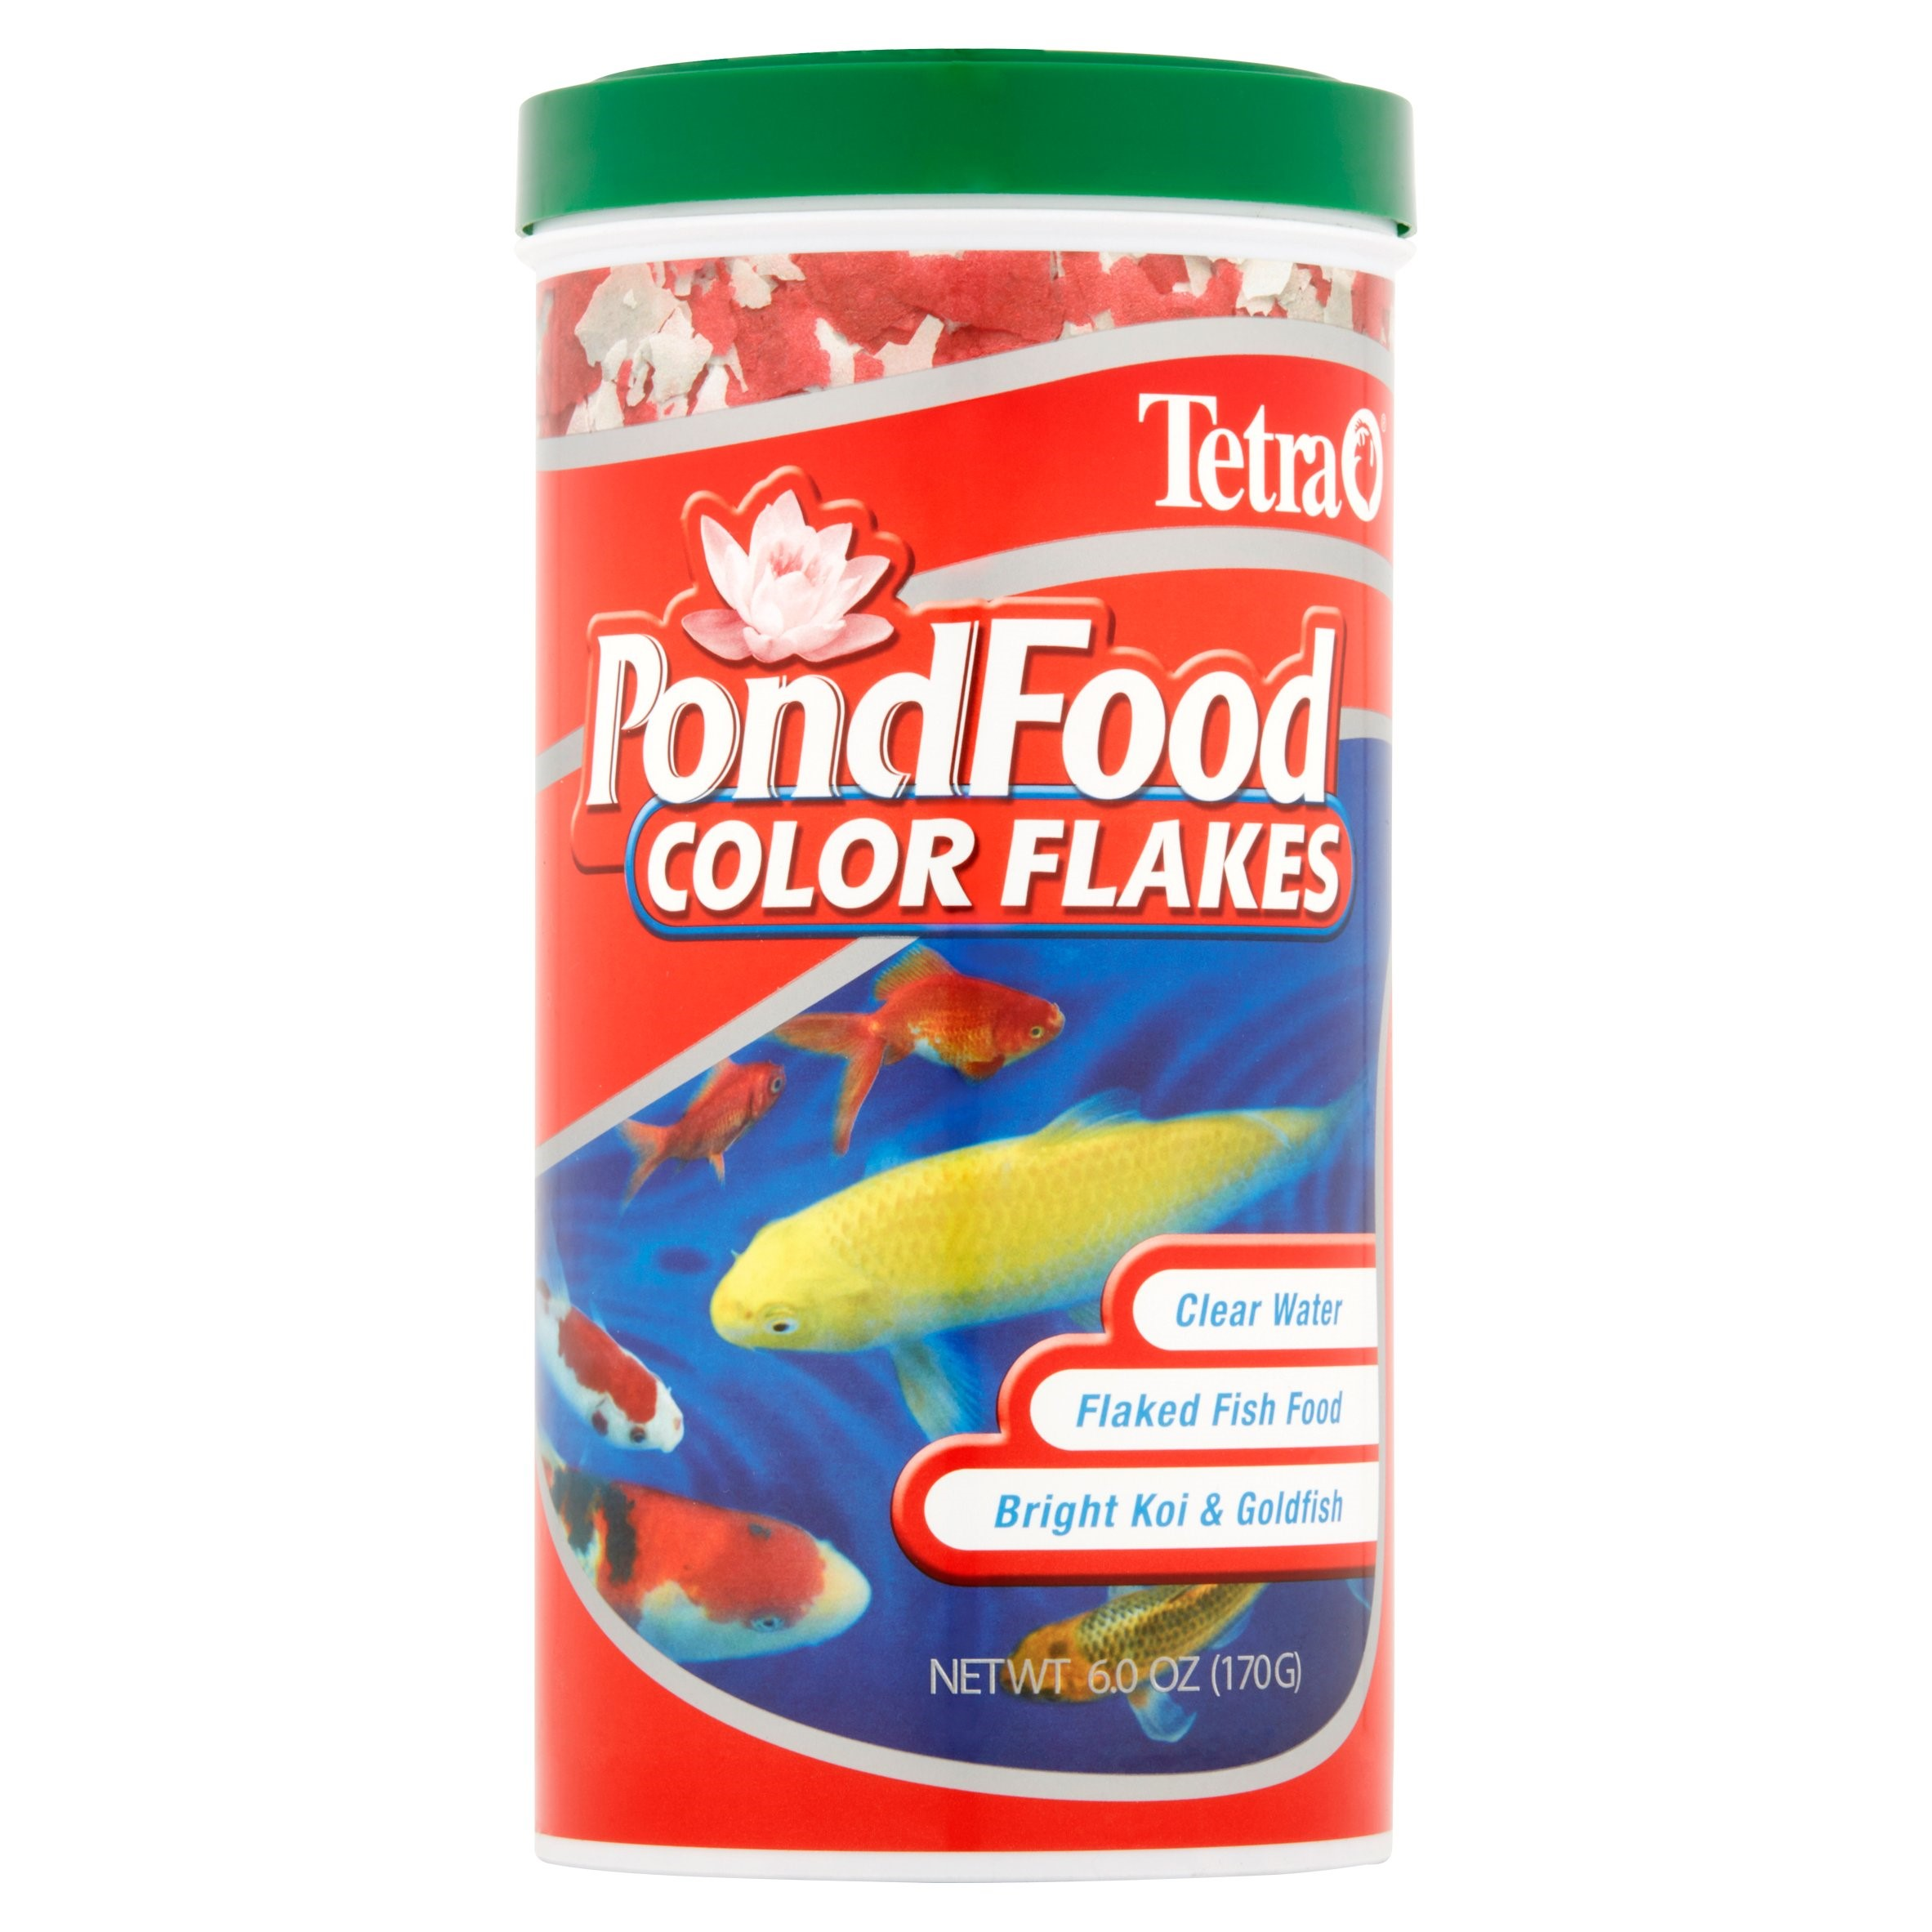 (2 Pack) Tetra PondFood Color Enhancing Flakes, Pond Fish Food, 6-oz.